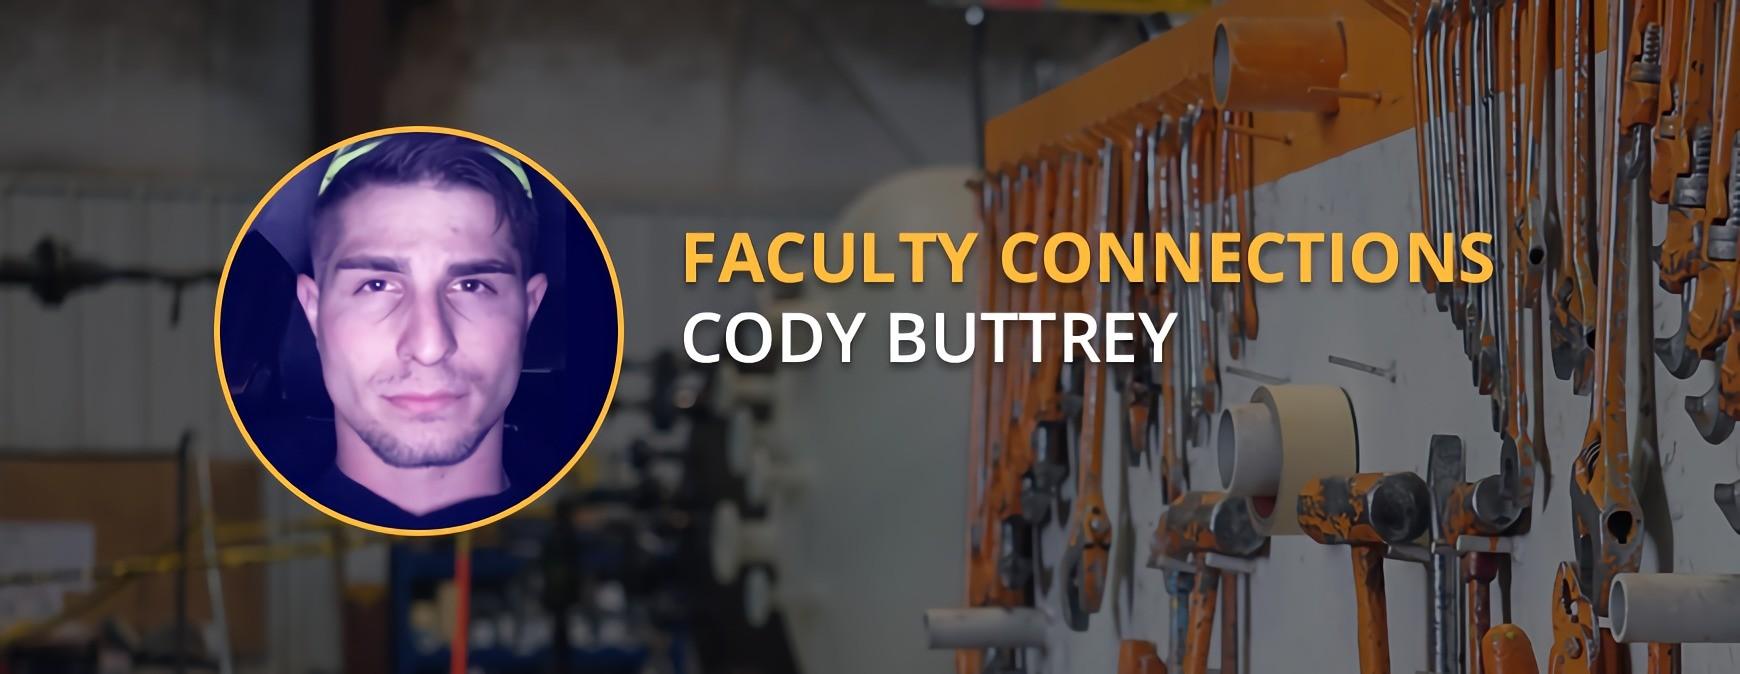 Cody Buttrey